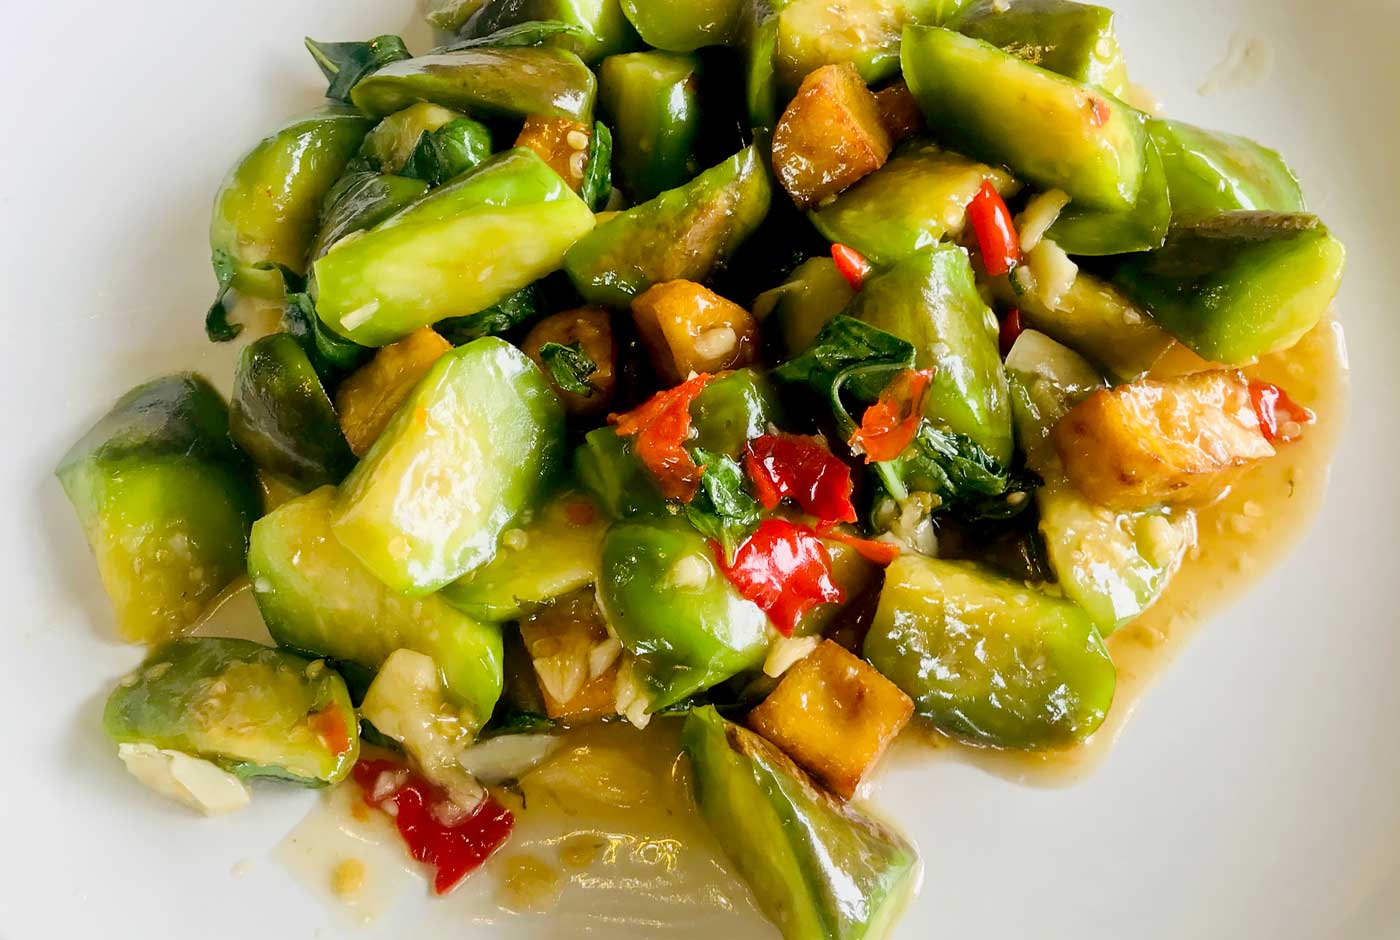 Stir Fried Thai Aubergine with Sweet Basil